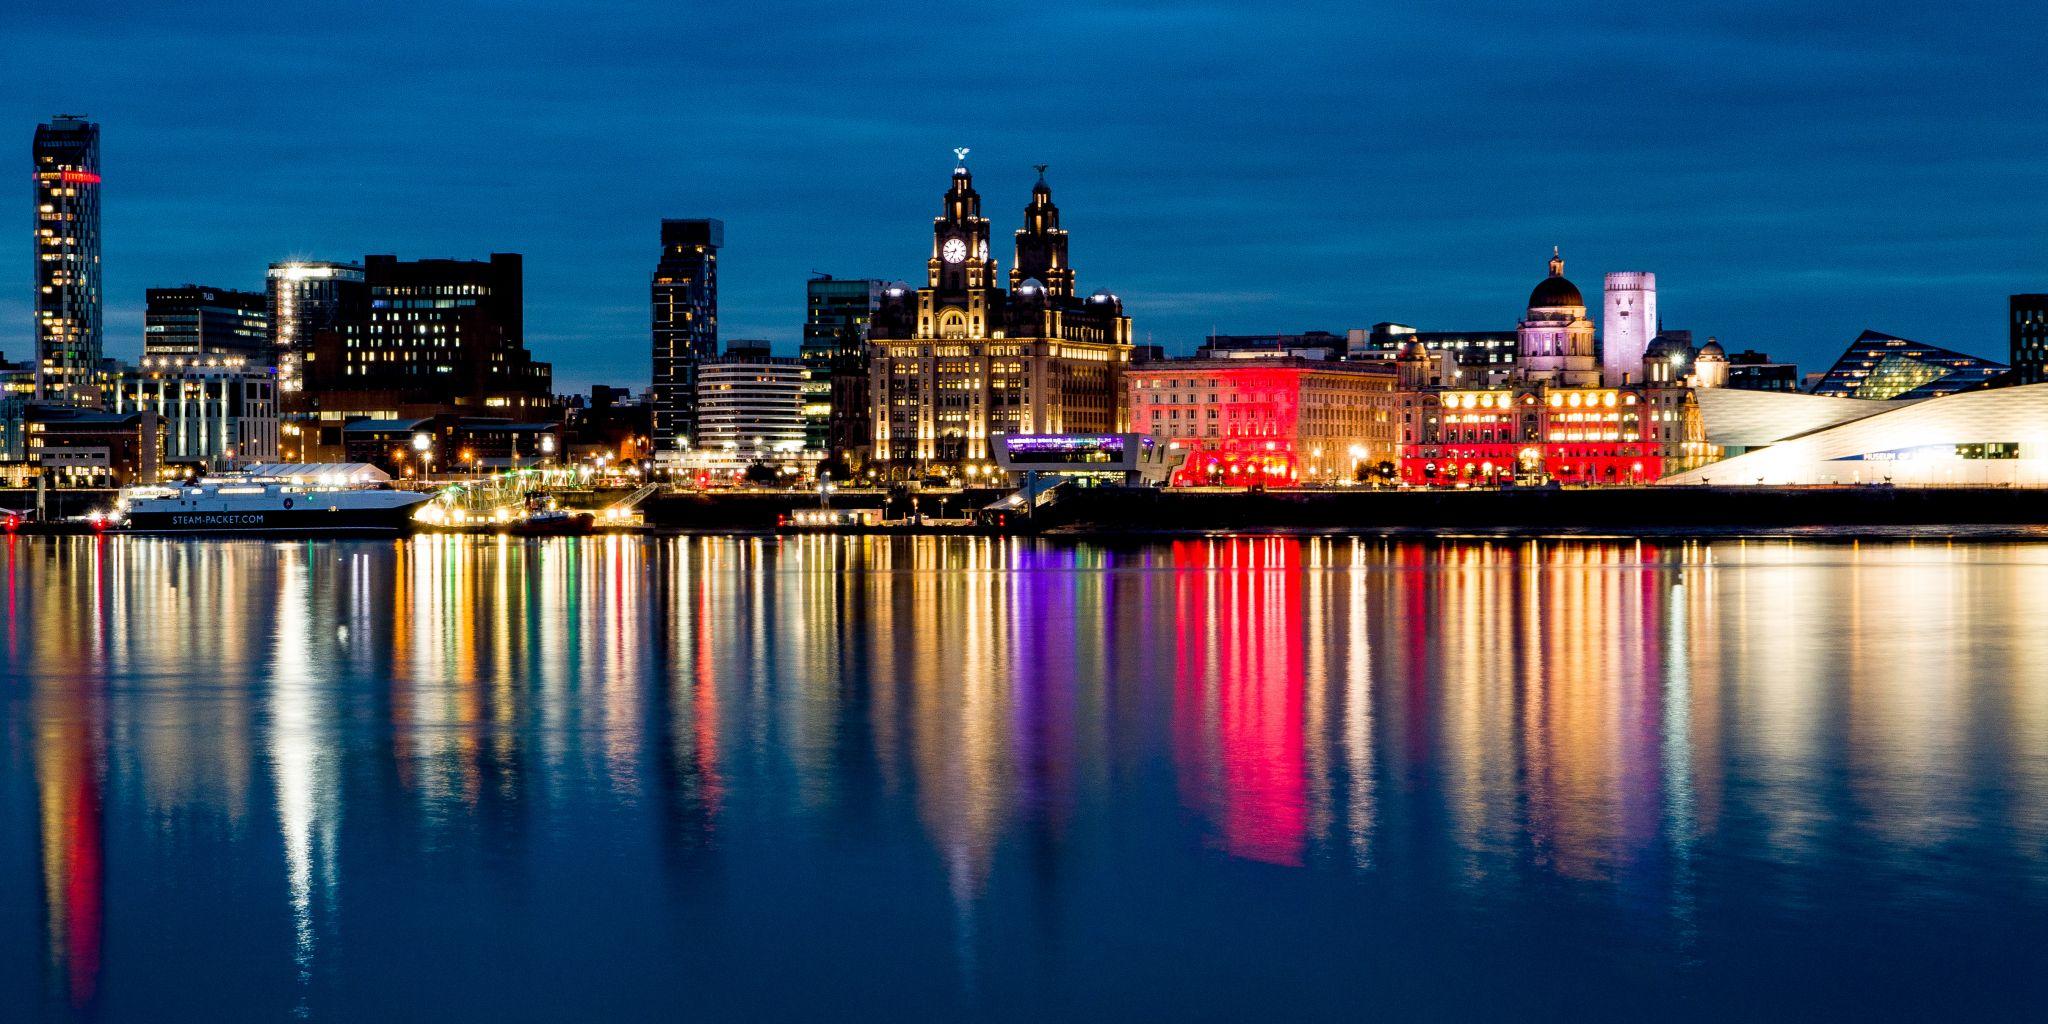 View of Liverpool, United Kingdom